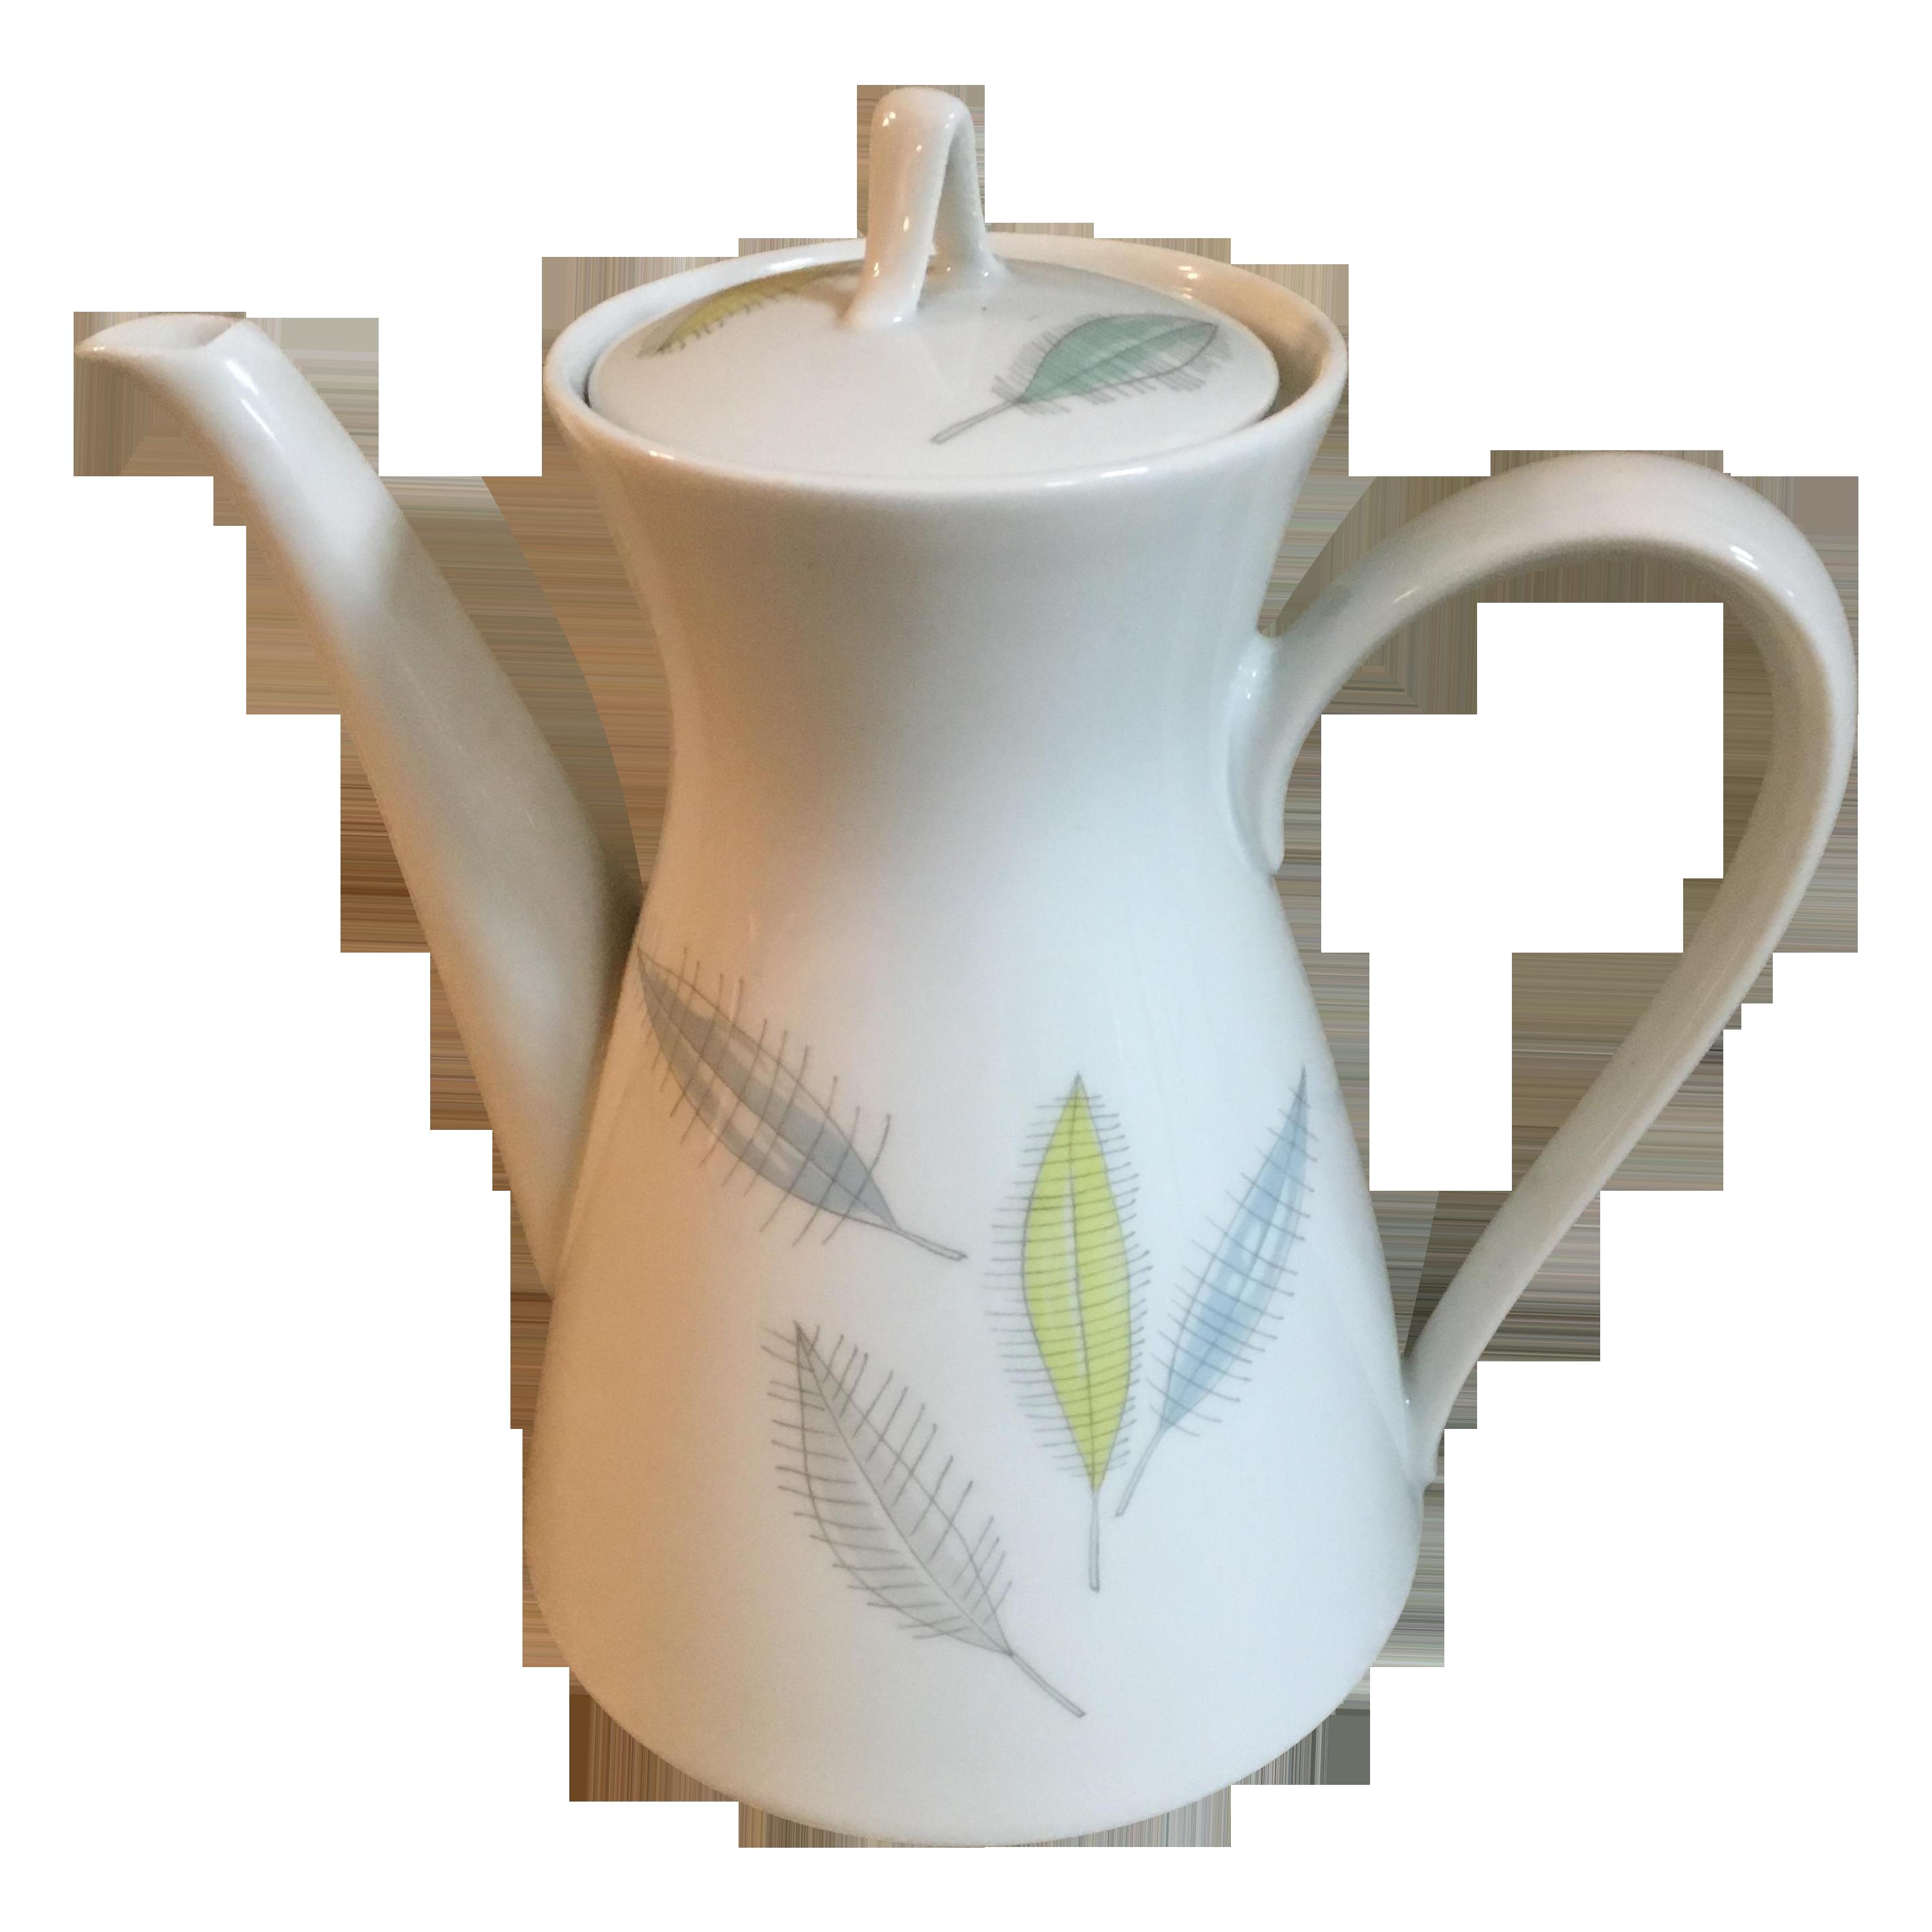 Vintage raymond loewy for. Mug clipart bucket